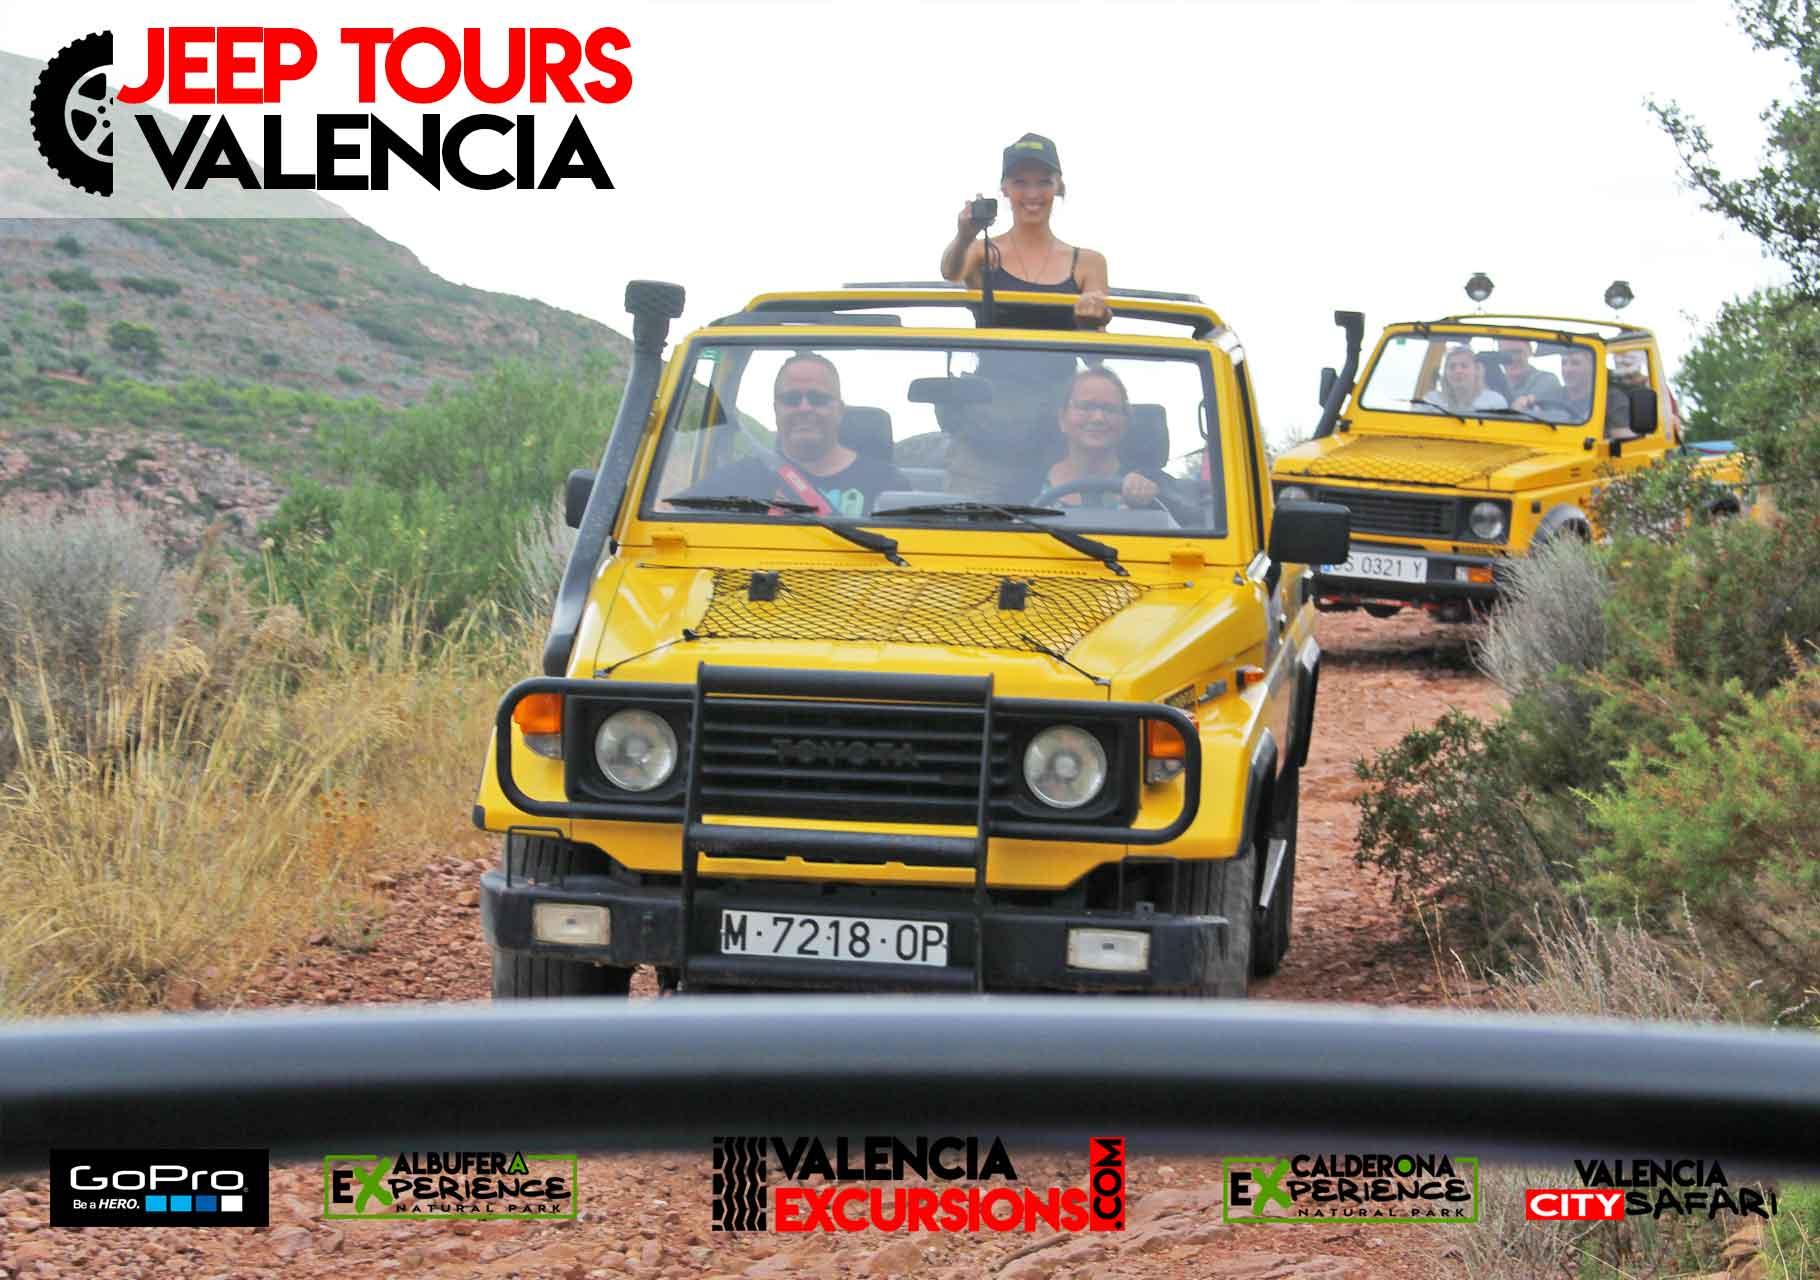 Jeep Tour Valencia Umgebung